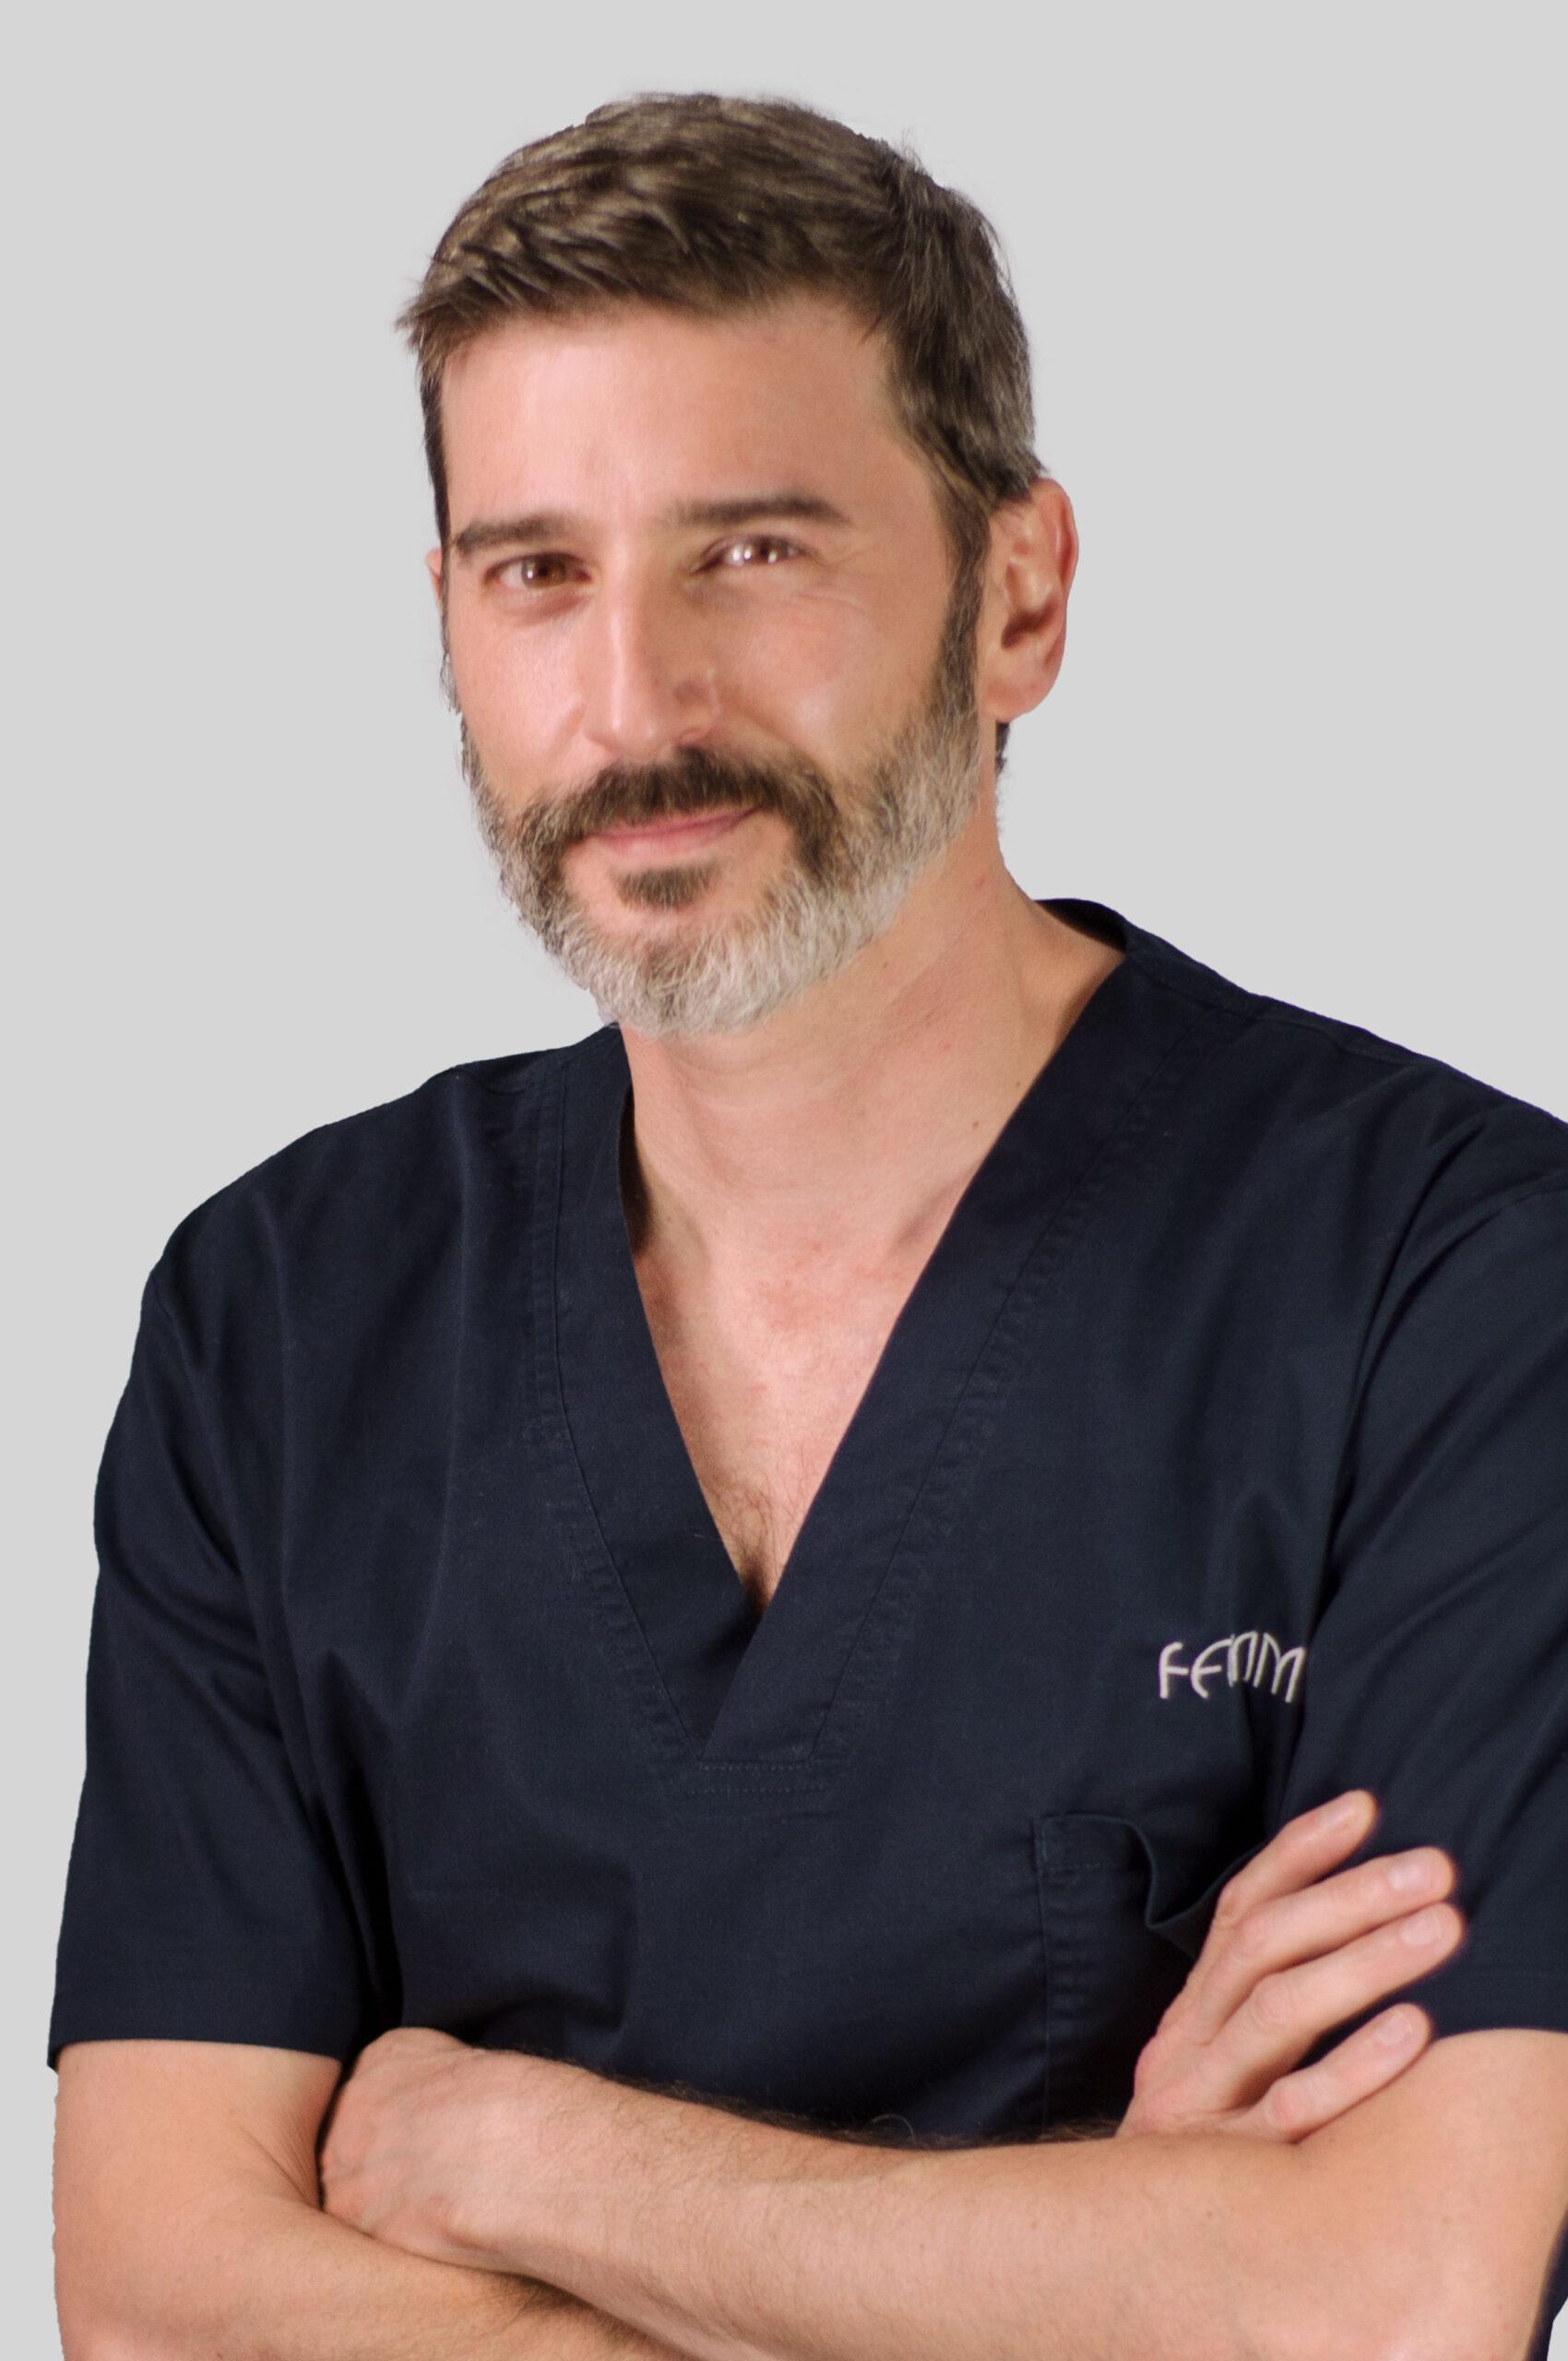 Dr. Eduardo Sánchez Jáuregui